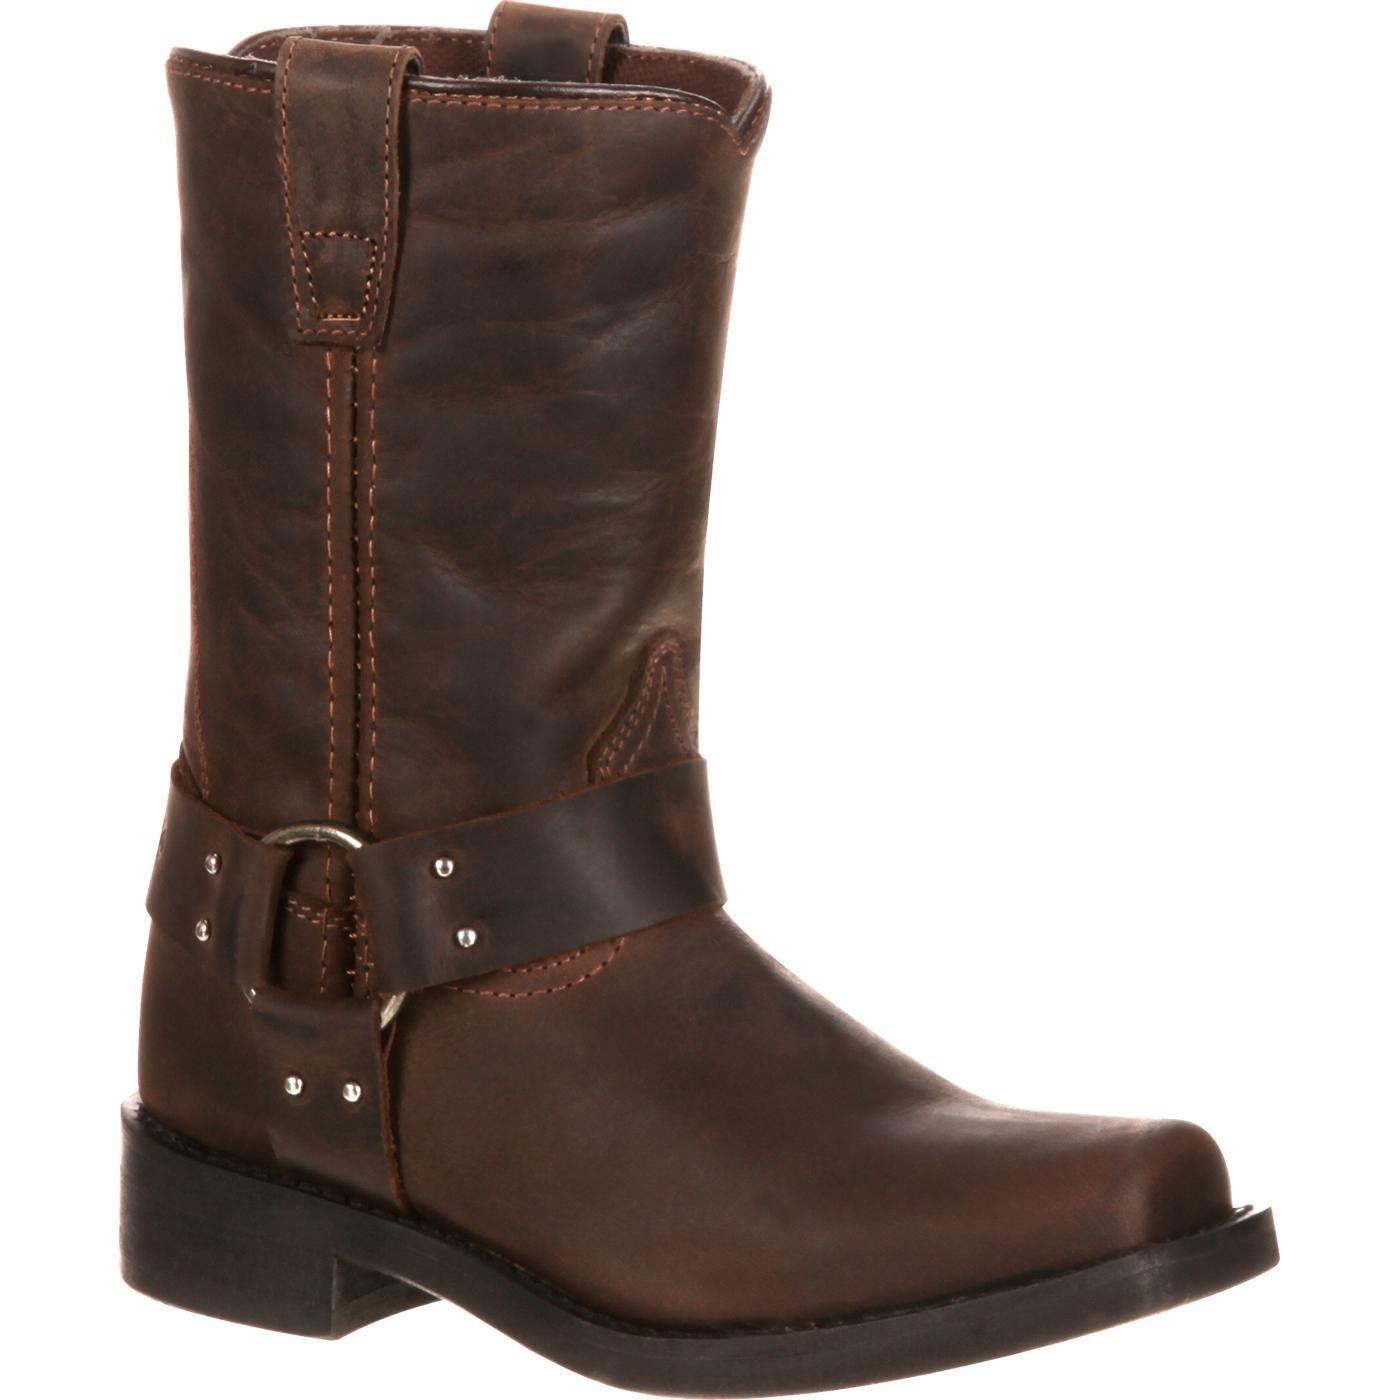 Durango Boot Children's DBT0123 8'' Harness,Distressed Brown Leather,US 13 M